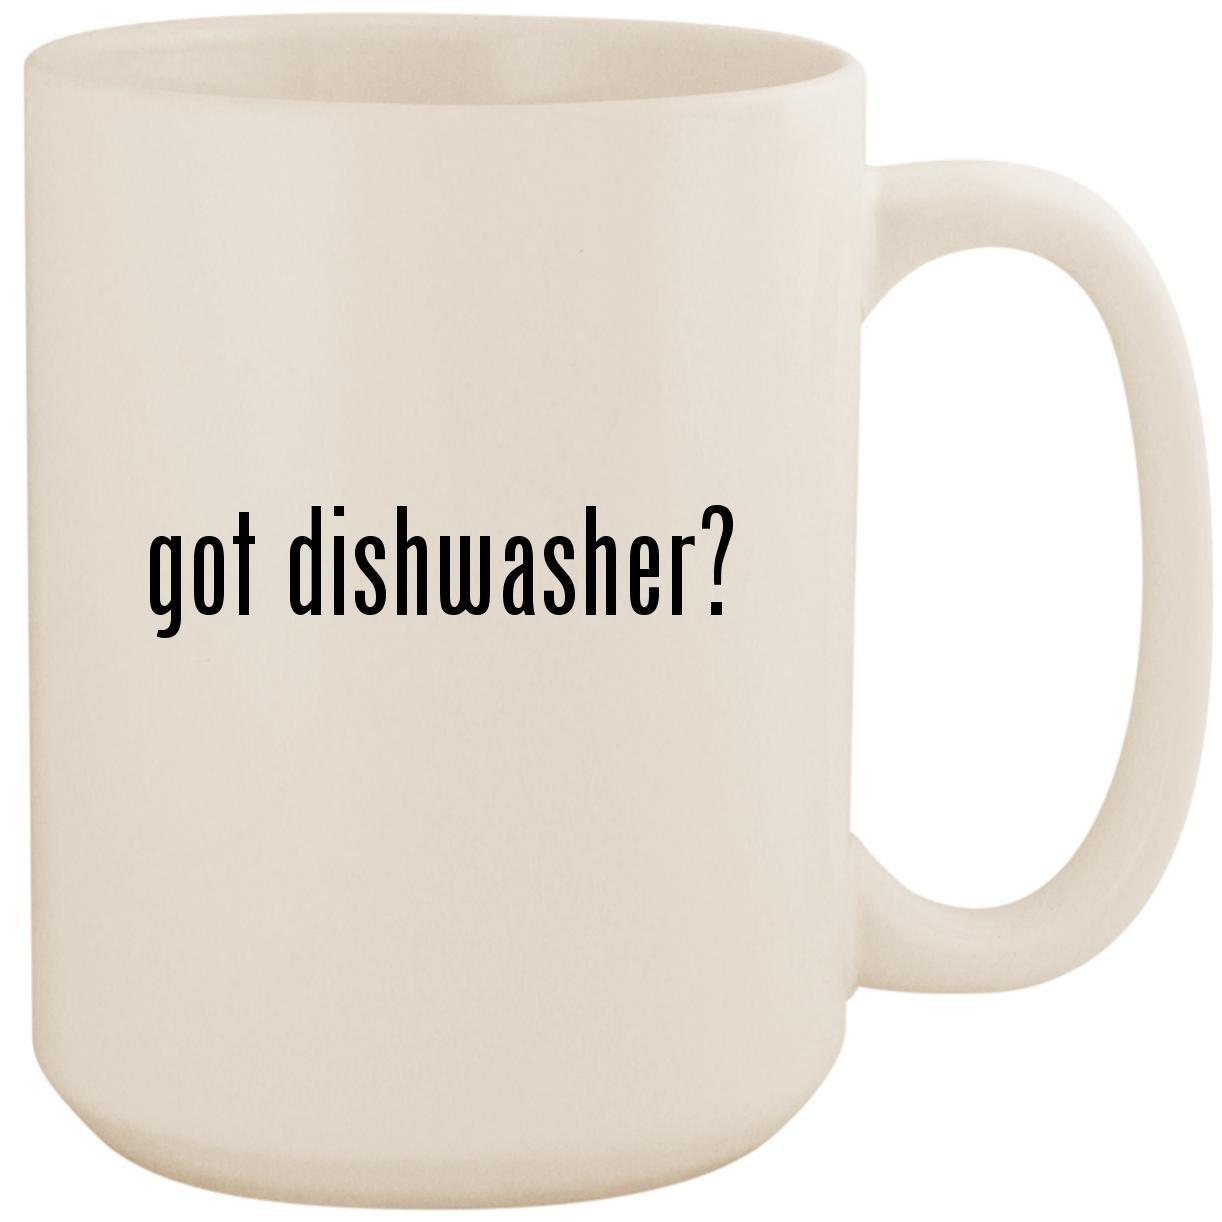 got dishwasher? - White 15oz Ceramic Coffee Mug Cup